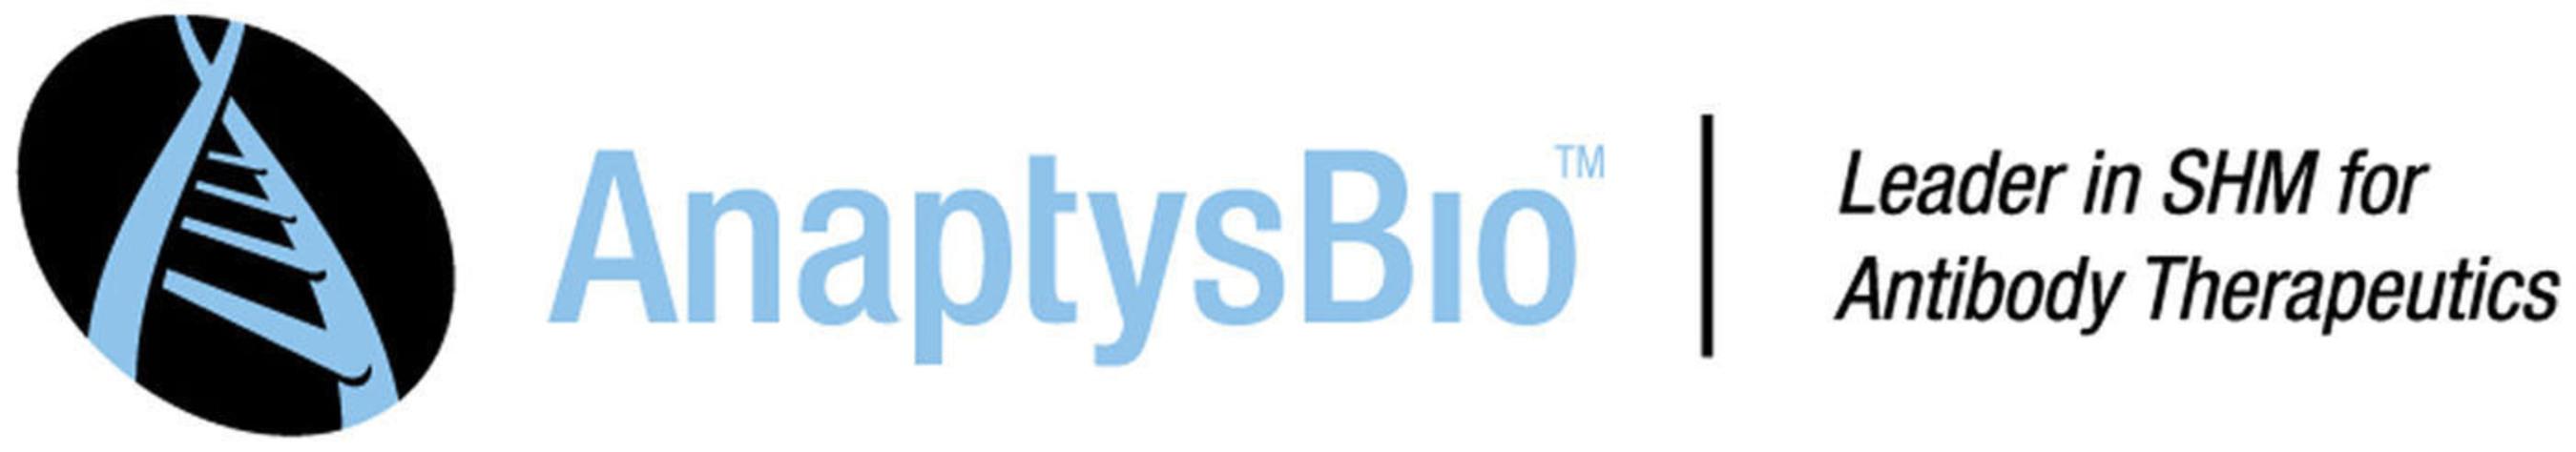 AnaptysBio Leader in SHM for Antibody Therapeutics www.anaptysbio.com